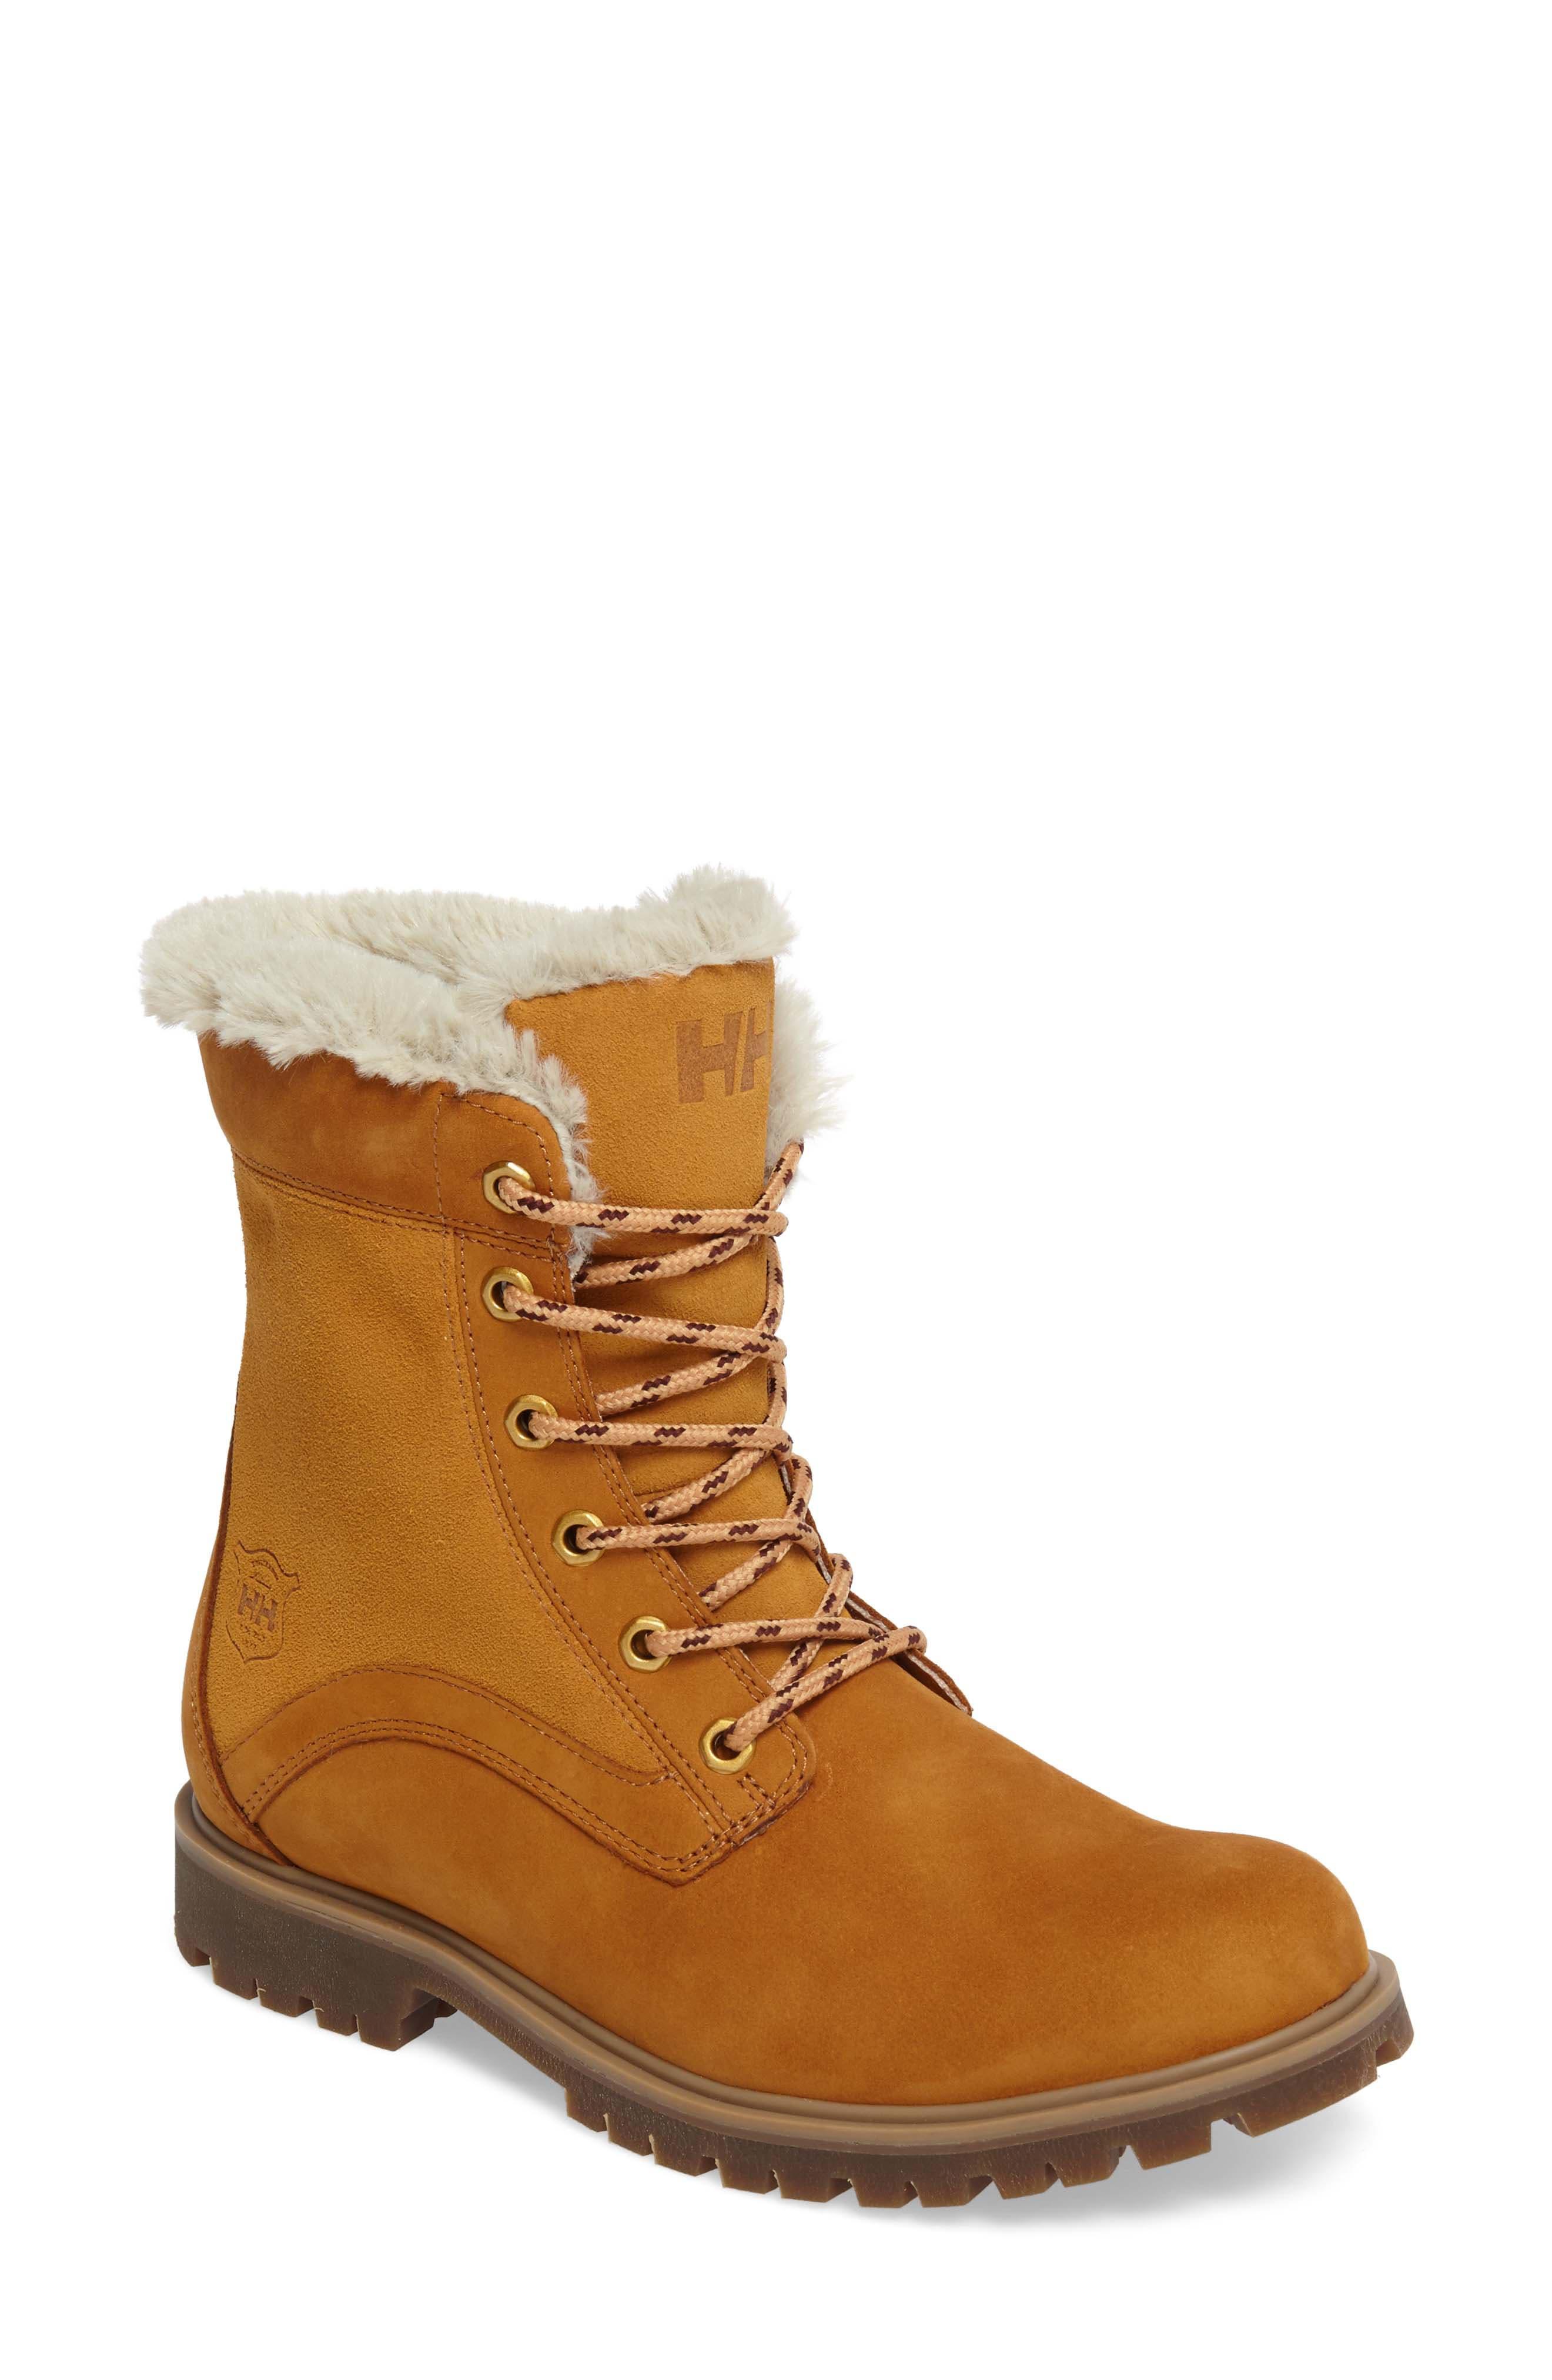 Alternate Image 1 Selected - Helly Hansen Marion Waterproof Winter Boot (Women)